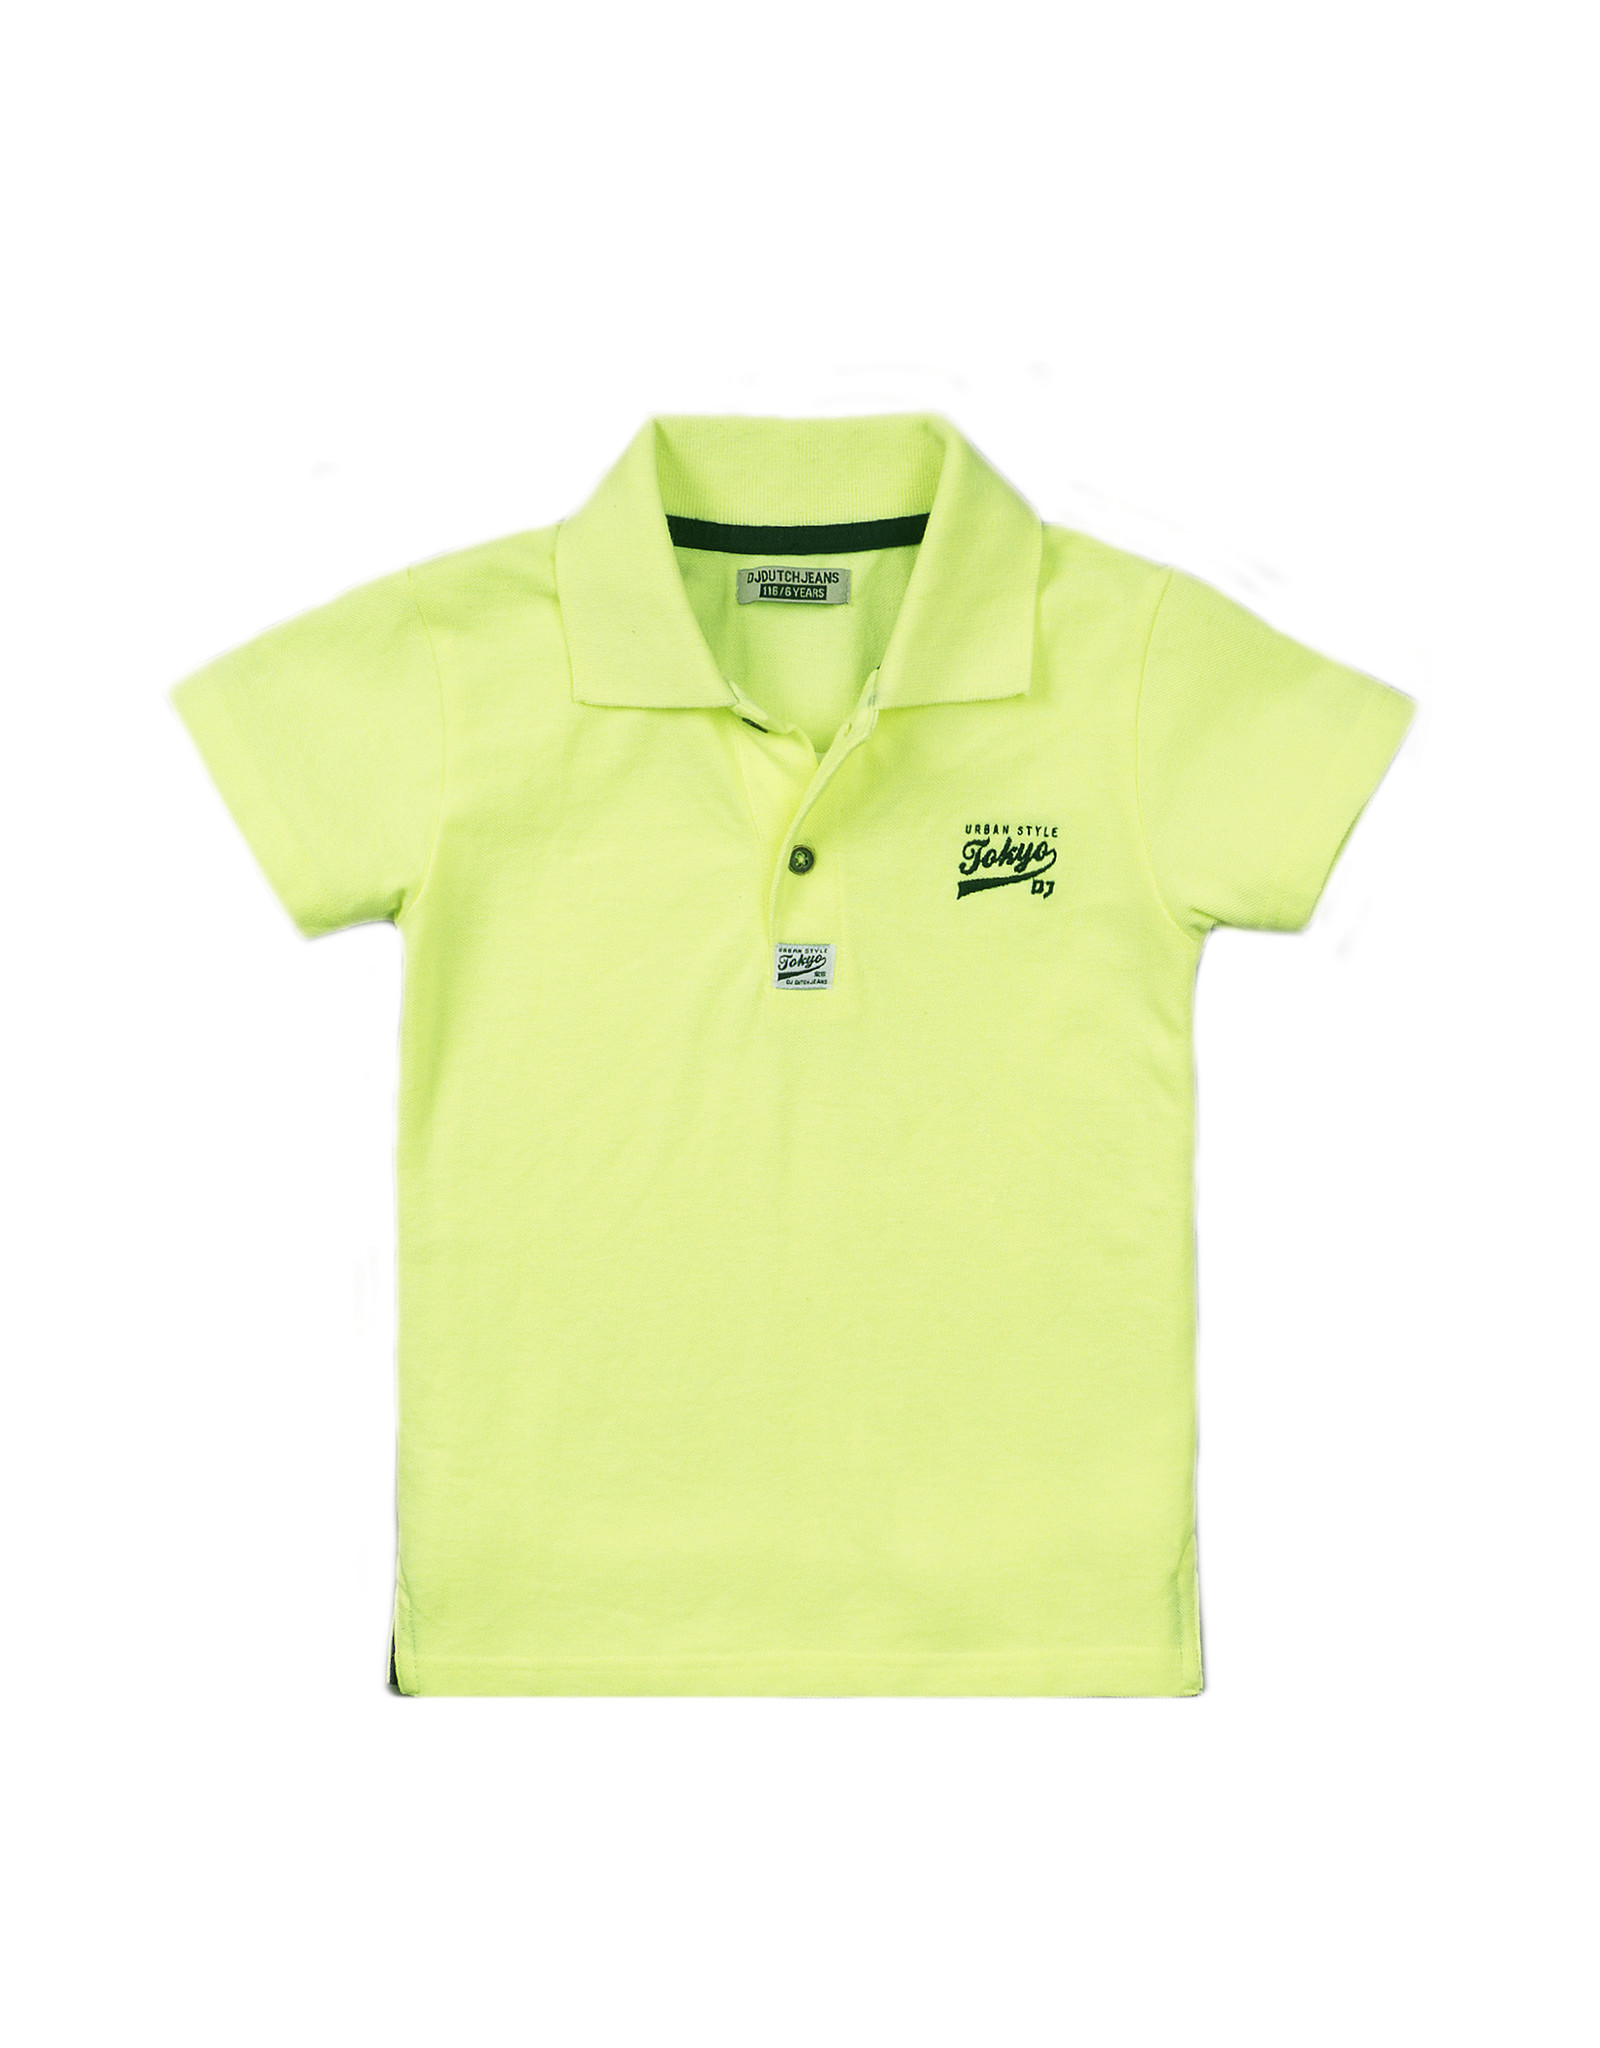 Dutch Jeans Polo ss, Neon yellow